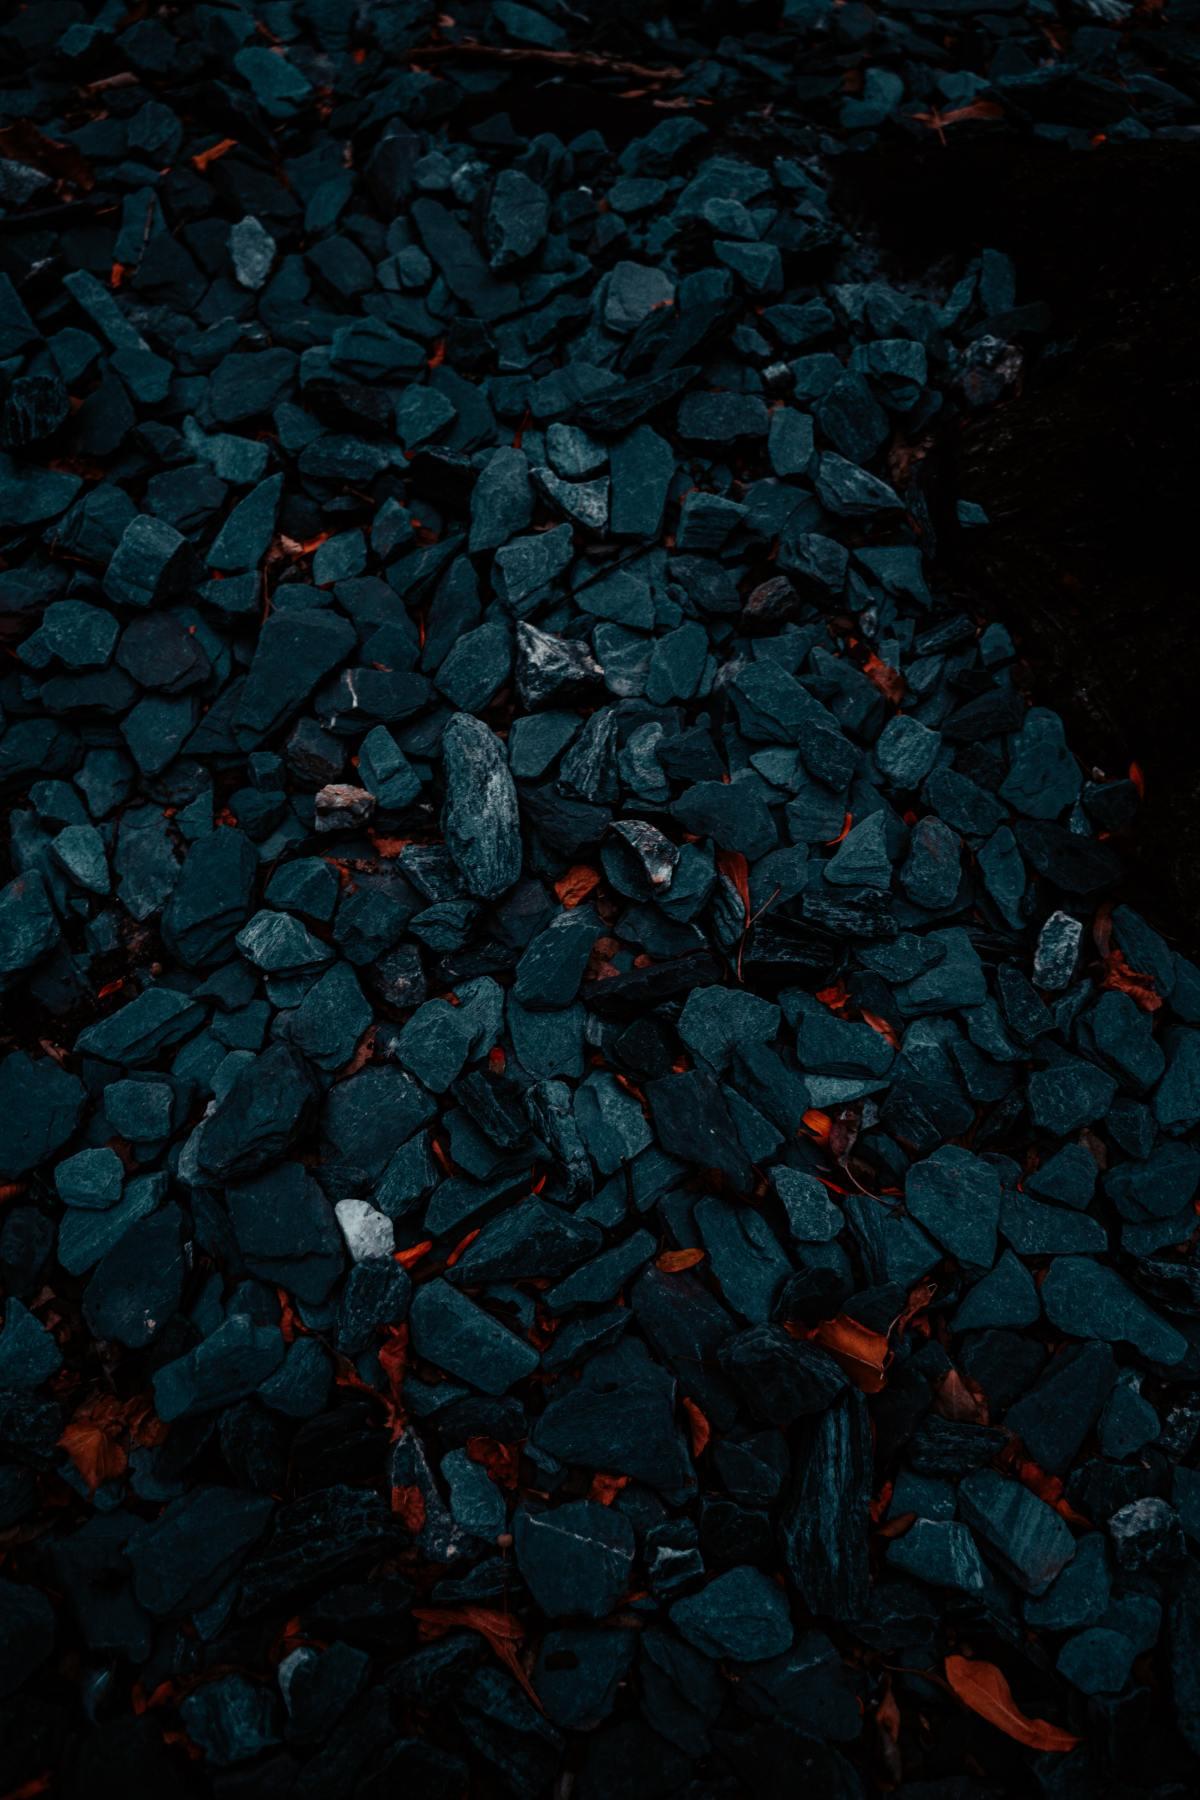 Chart Coal Jelas Menunjukkan Bullish Namun Secara LogikaMeragukan